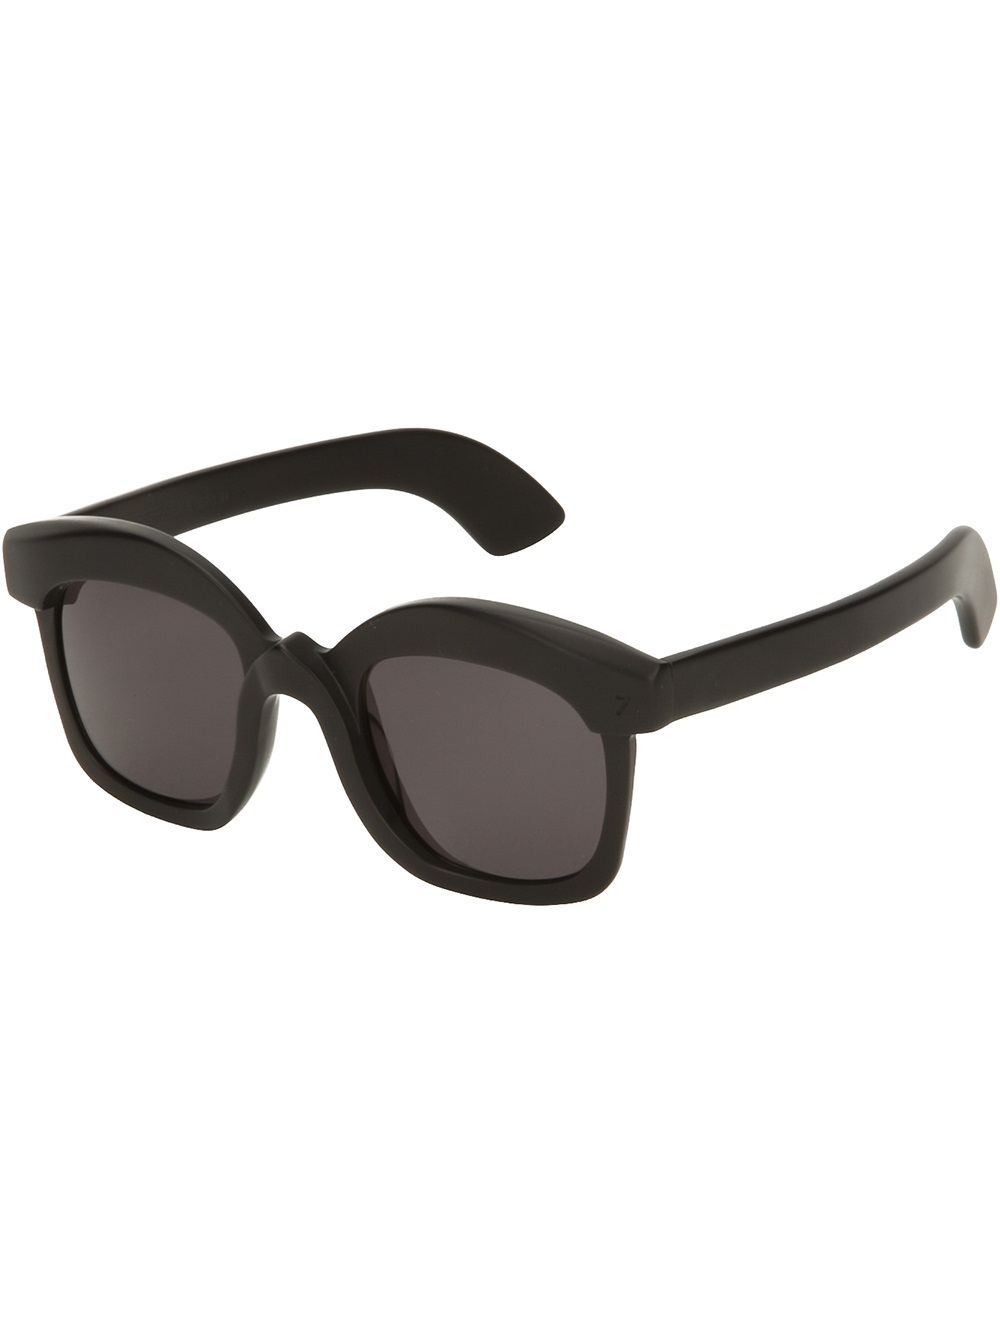 Black Frame Square Glasses : Kuboraum Square Frame Sunglasses in Black Lyst